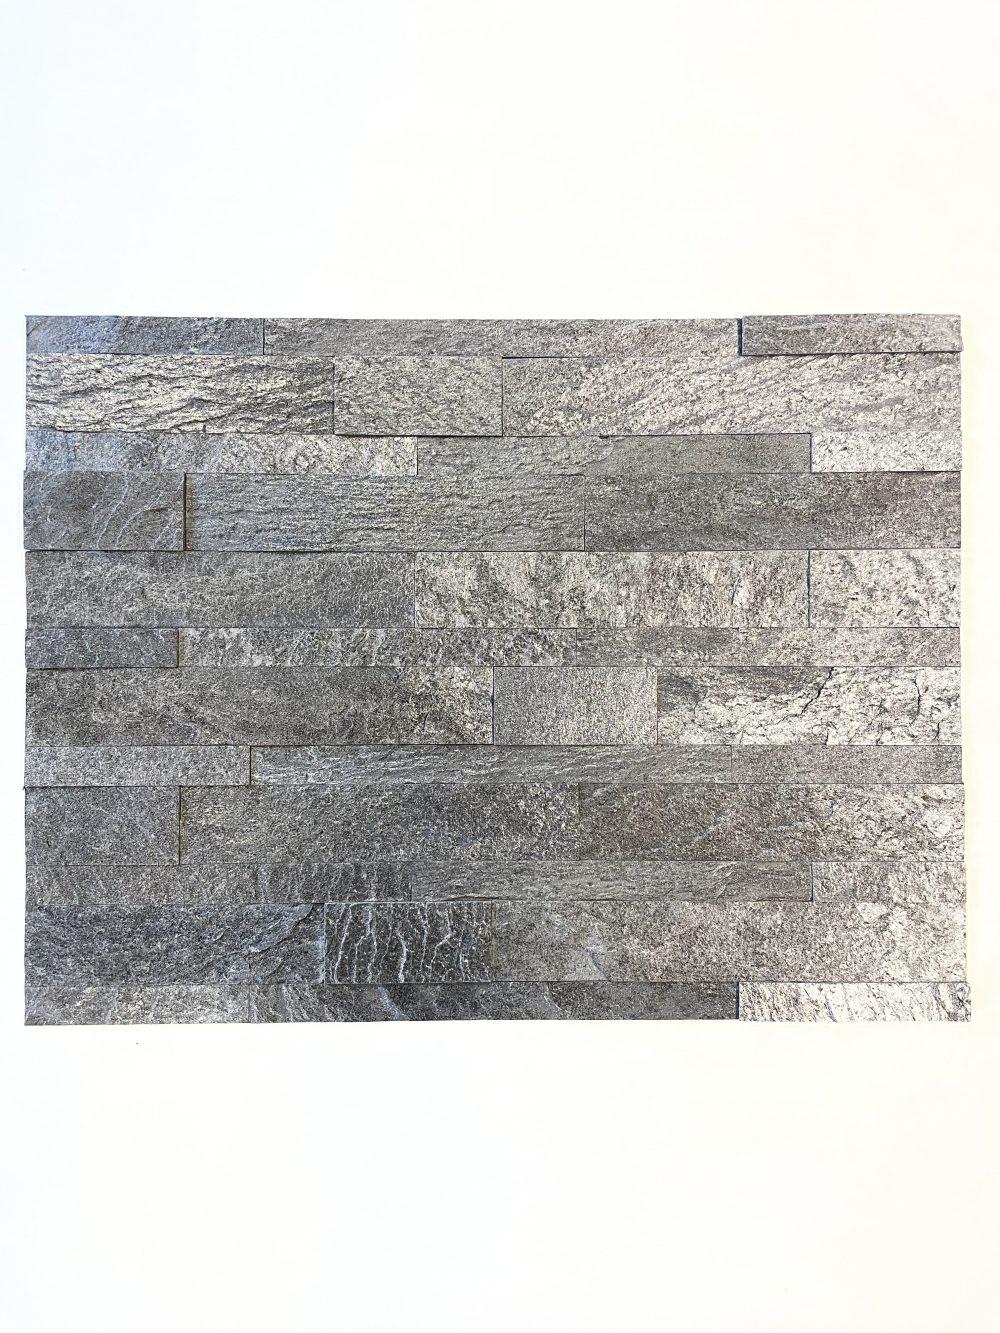 Steinpaneele Natursteinwand verkleidung Steinoptik Tapete